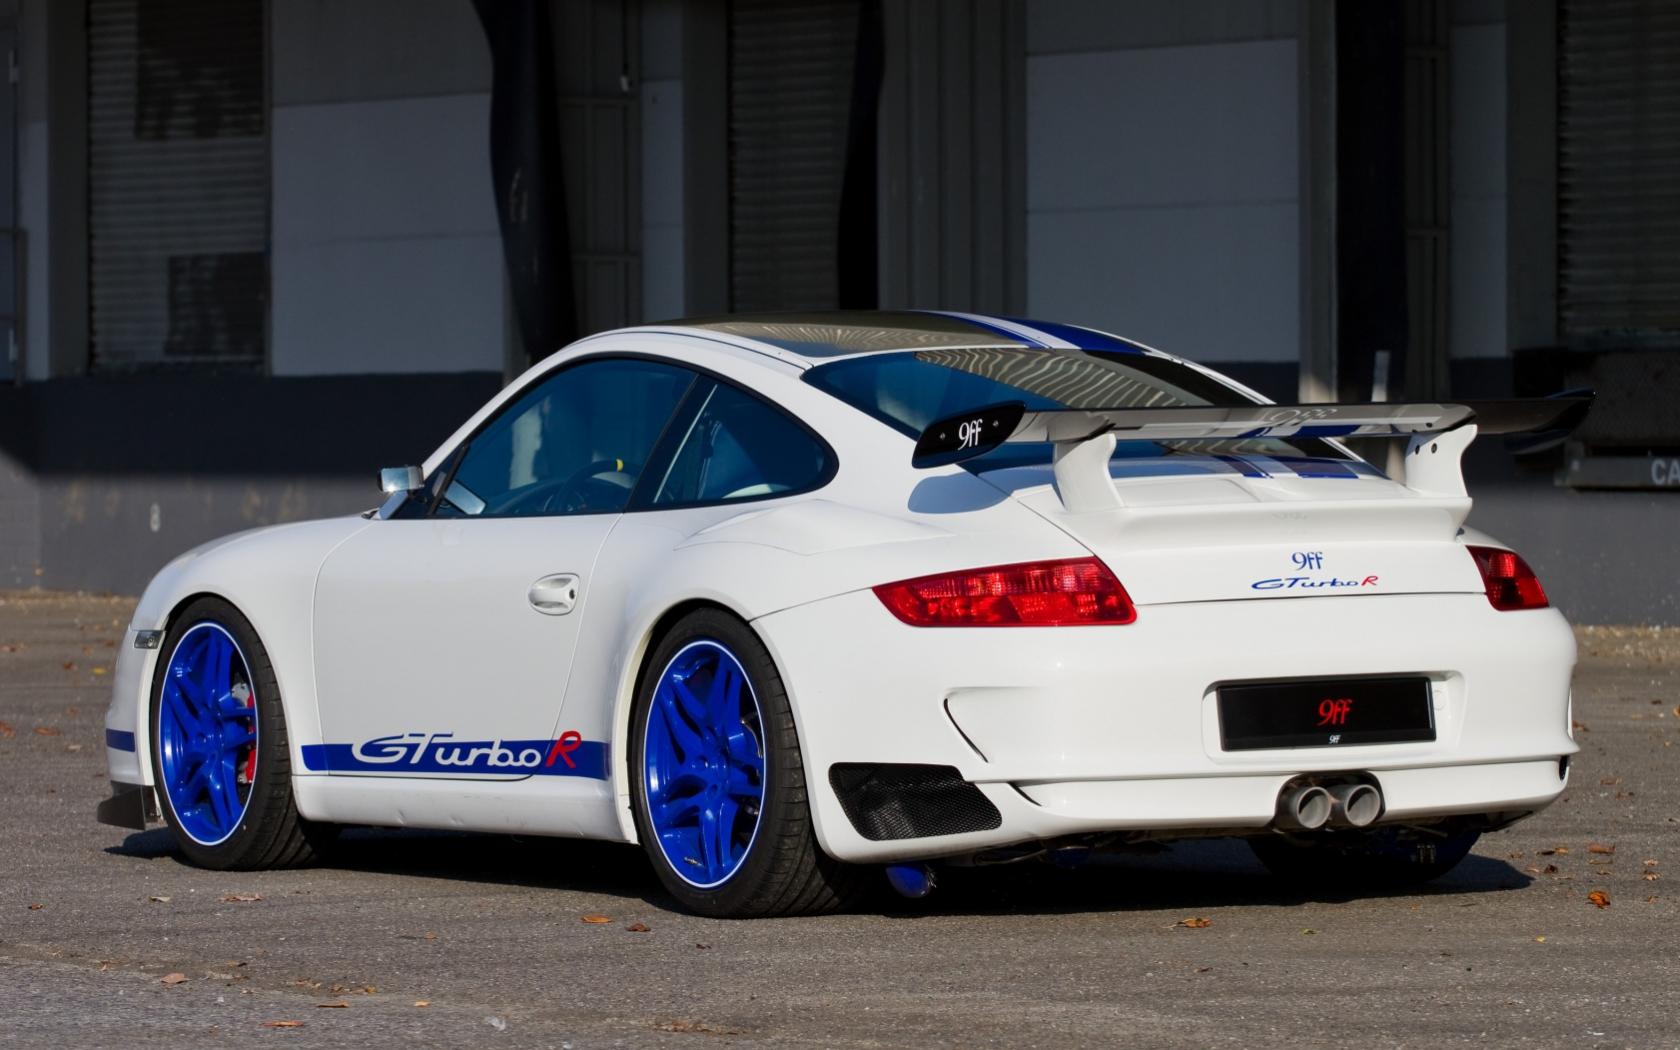 Porsche images 9ff GTurbo R PORSCHE 911 997 TURBO HD 1680x1050